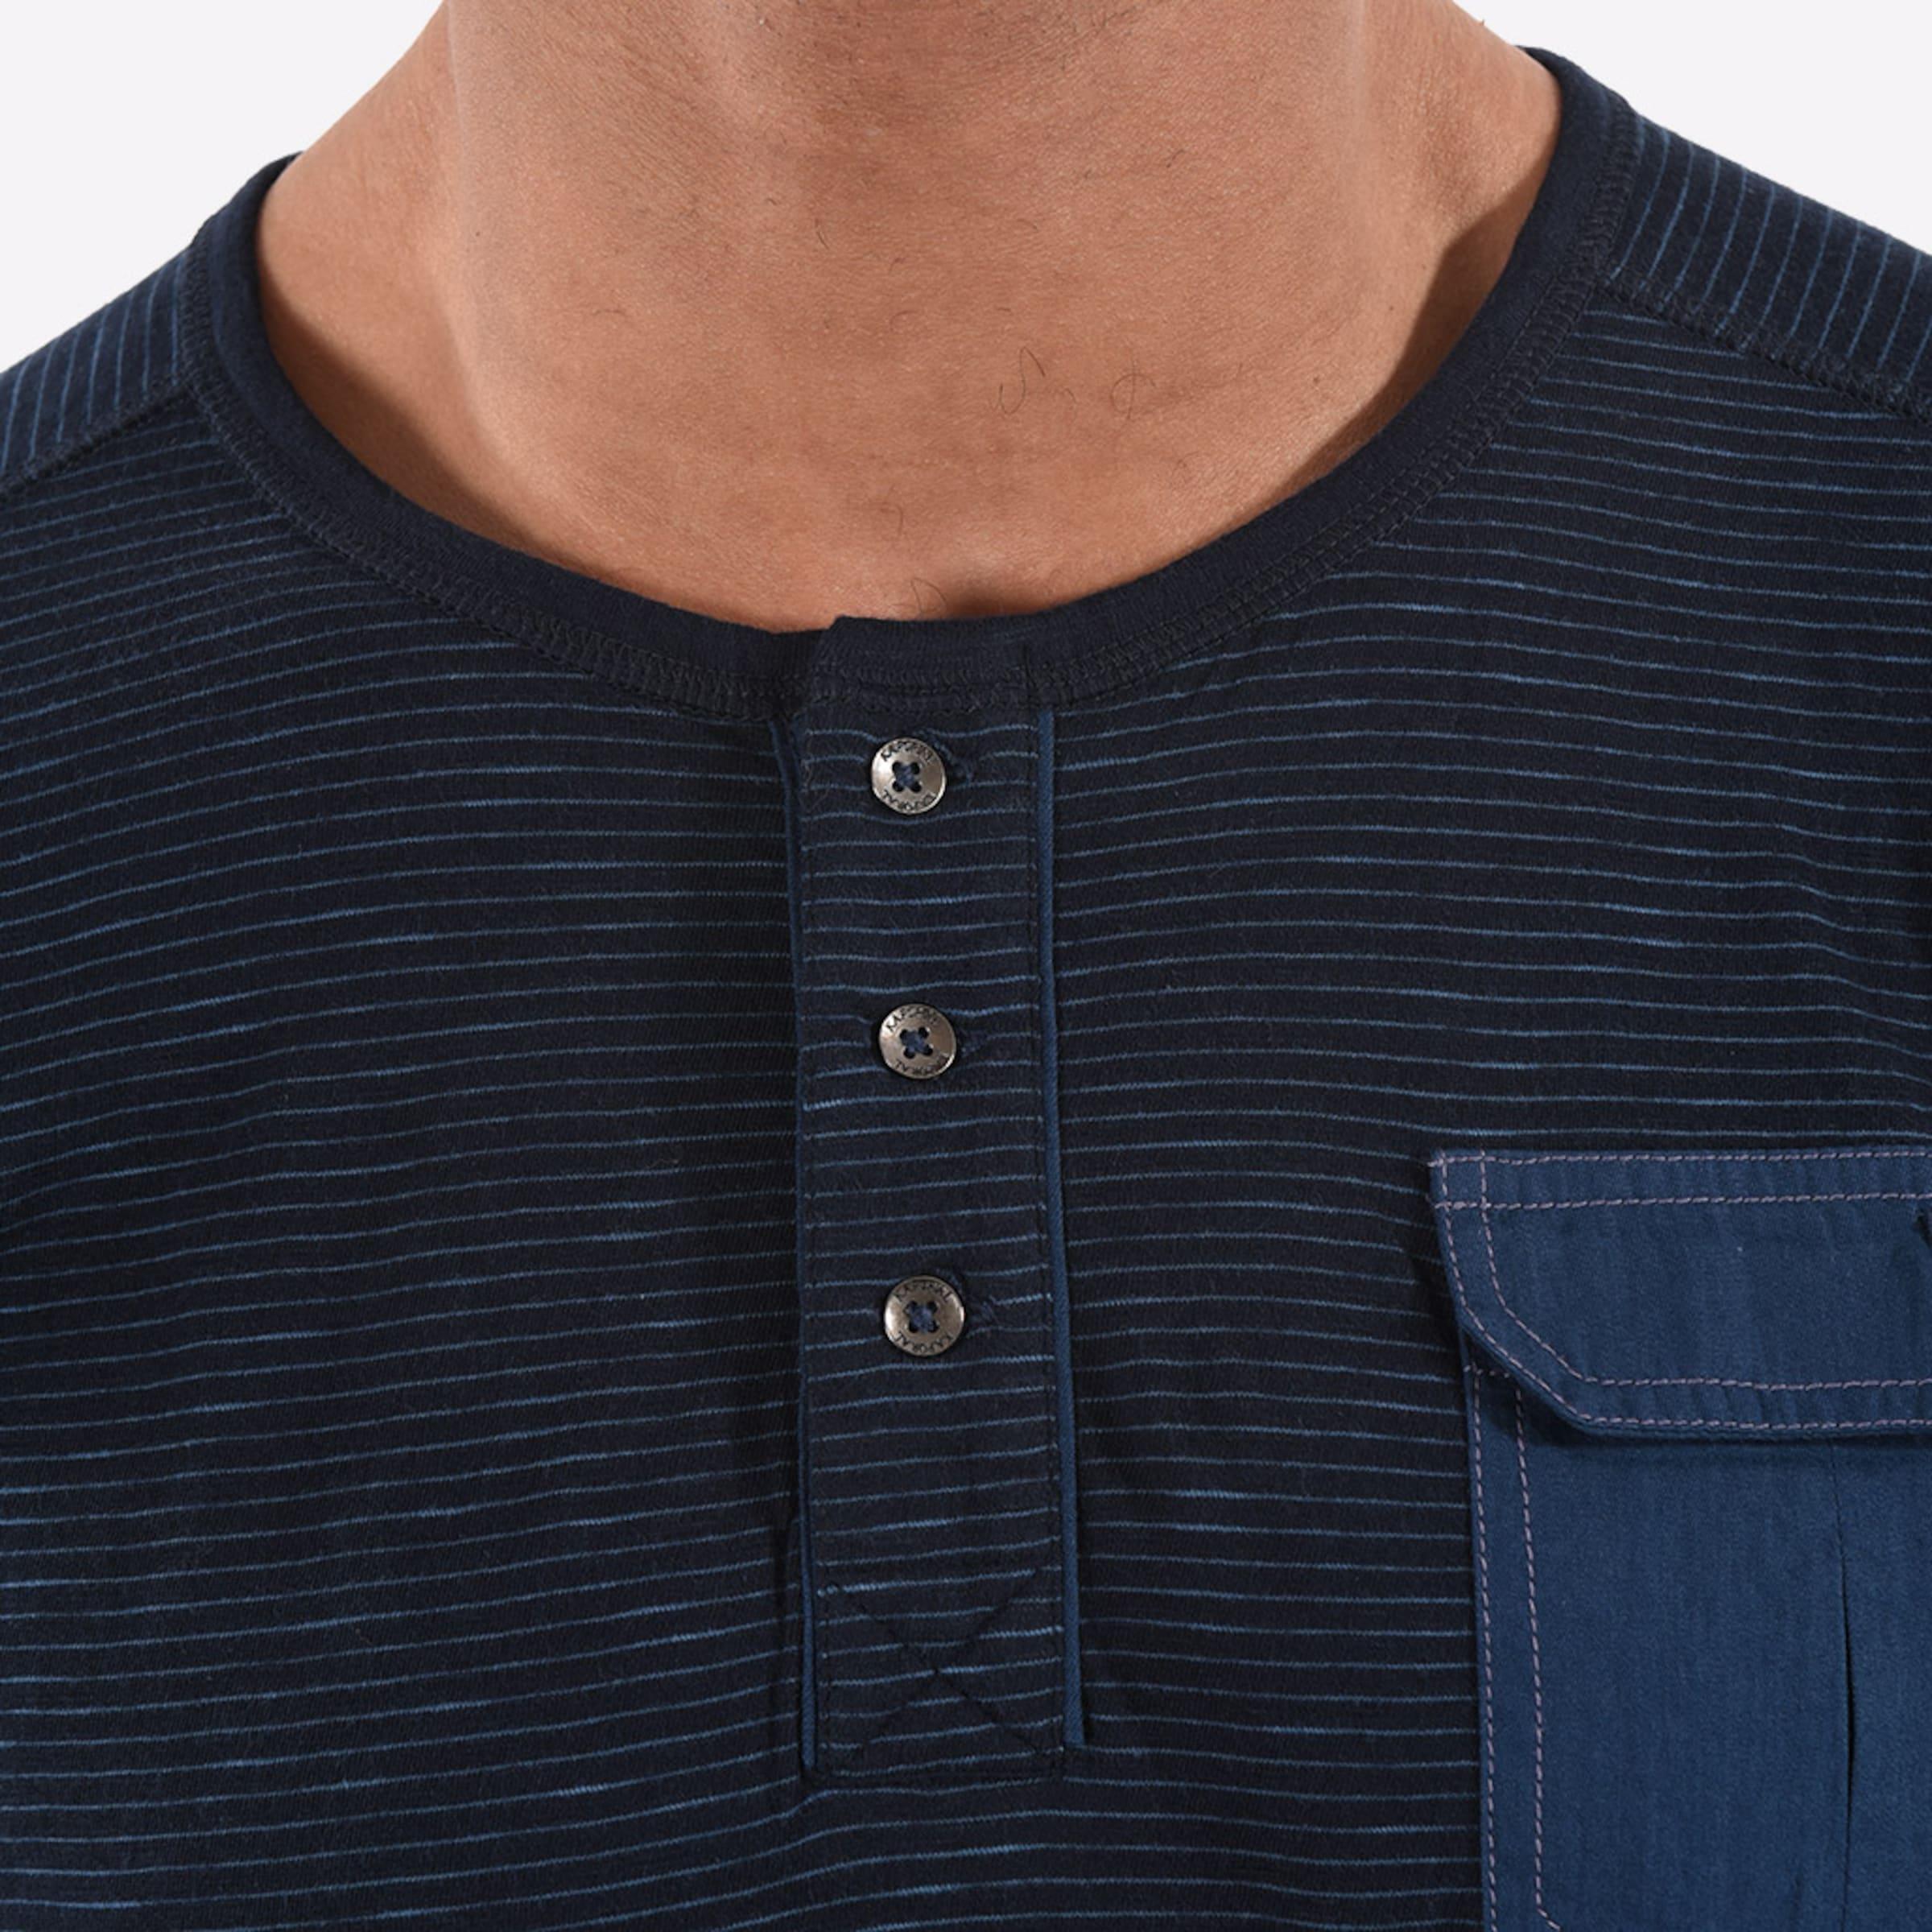 Shirt In Kaporal 'land Blueus' MarineNachtblau Y6fvby7g